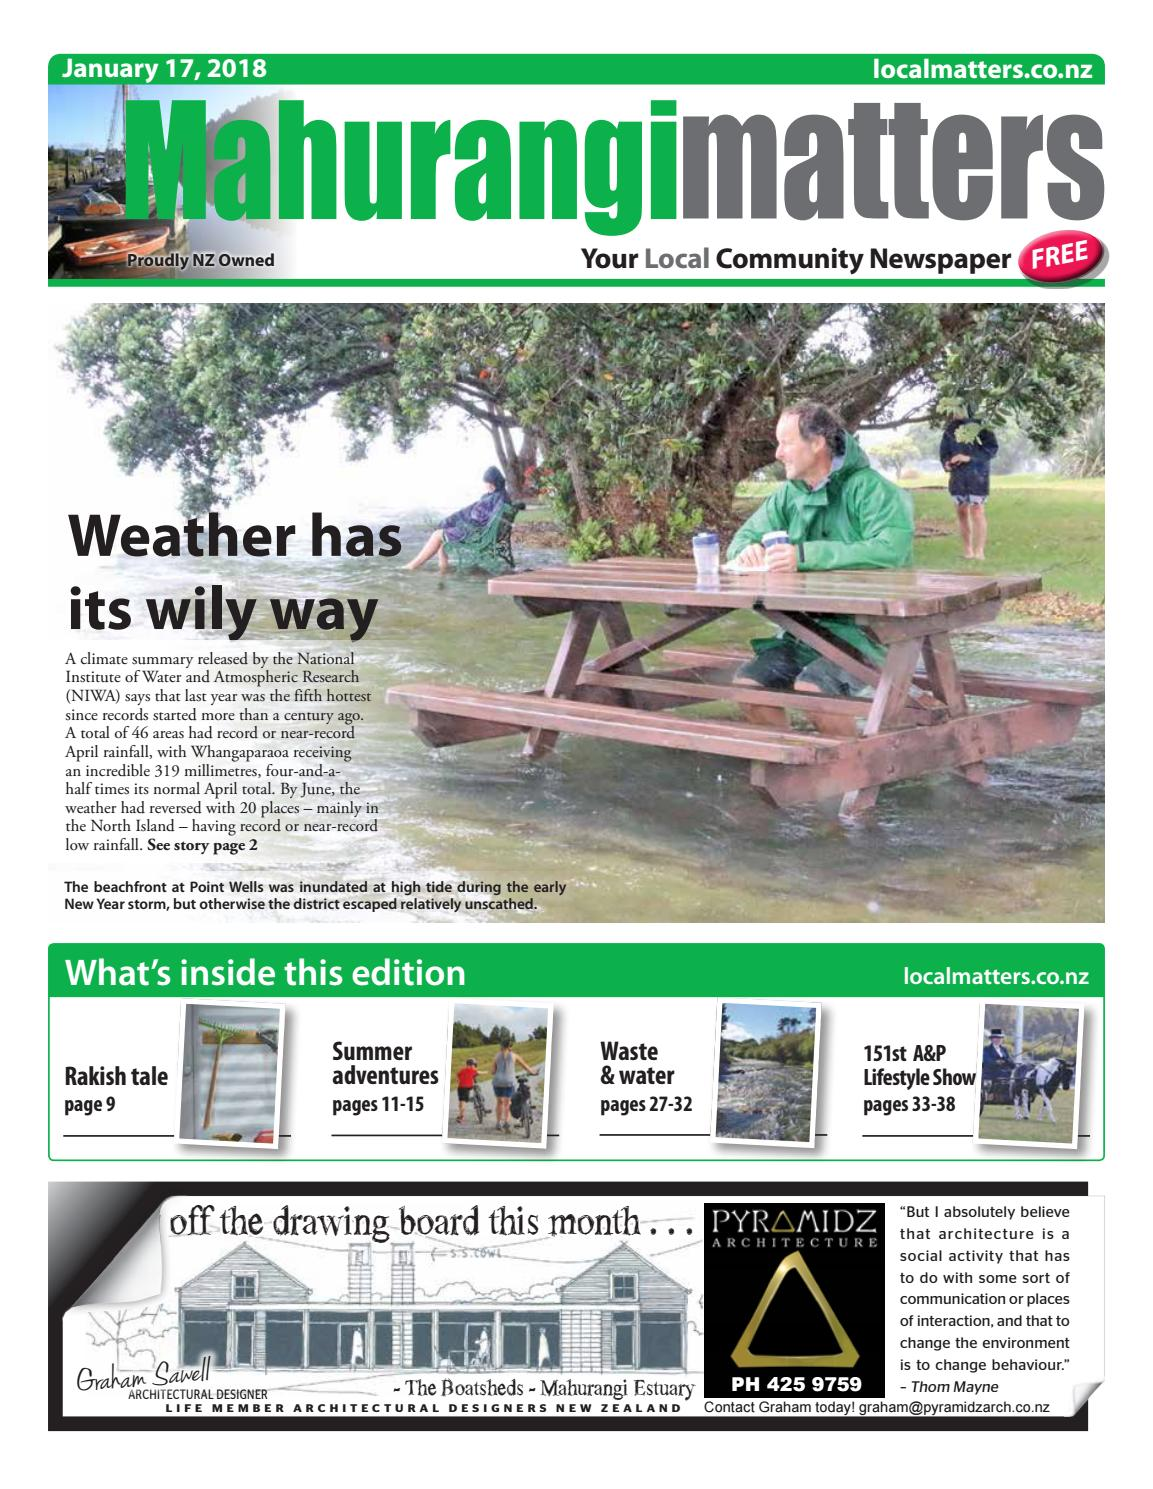 4a4f2b4180540 Mahurangi Mattters 17 Jan 2018 by Localmatters - issuu